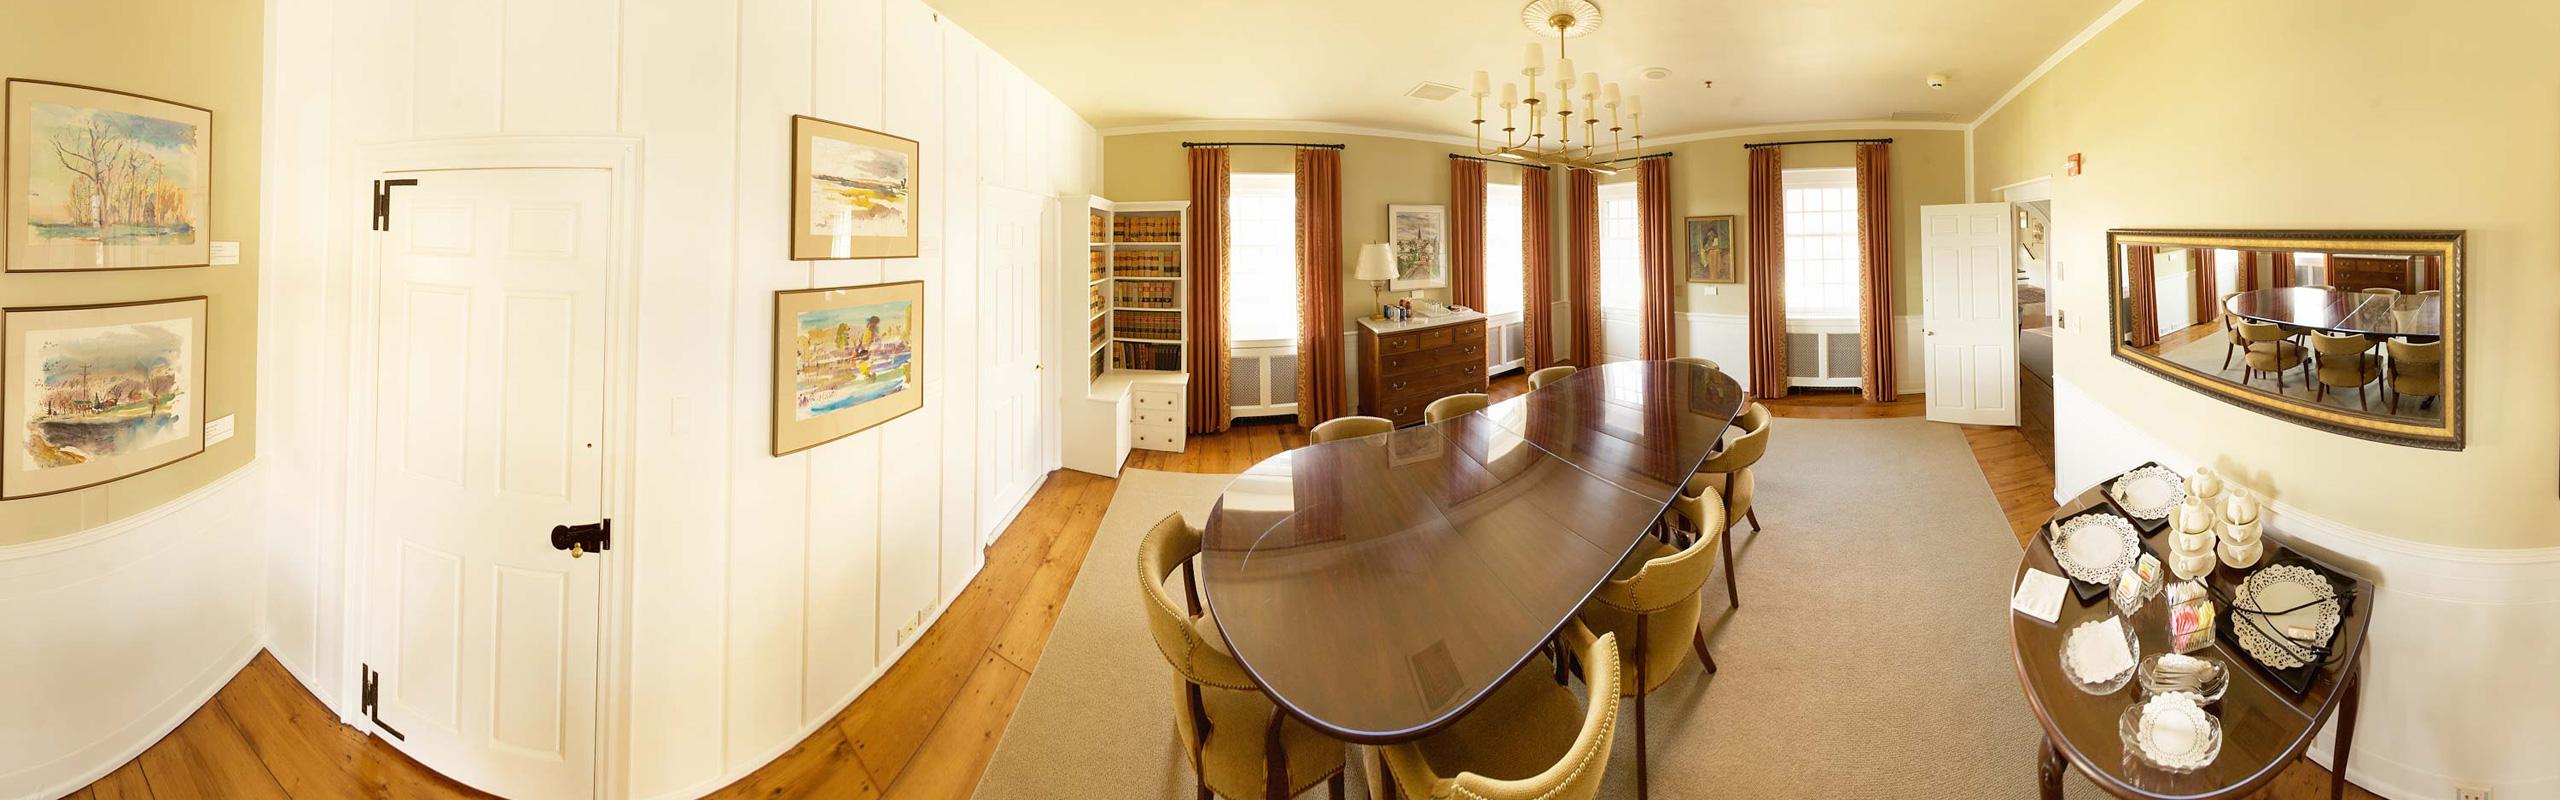 Douglass Room